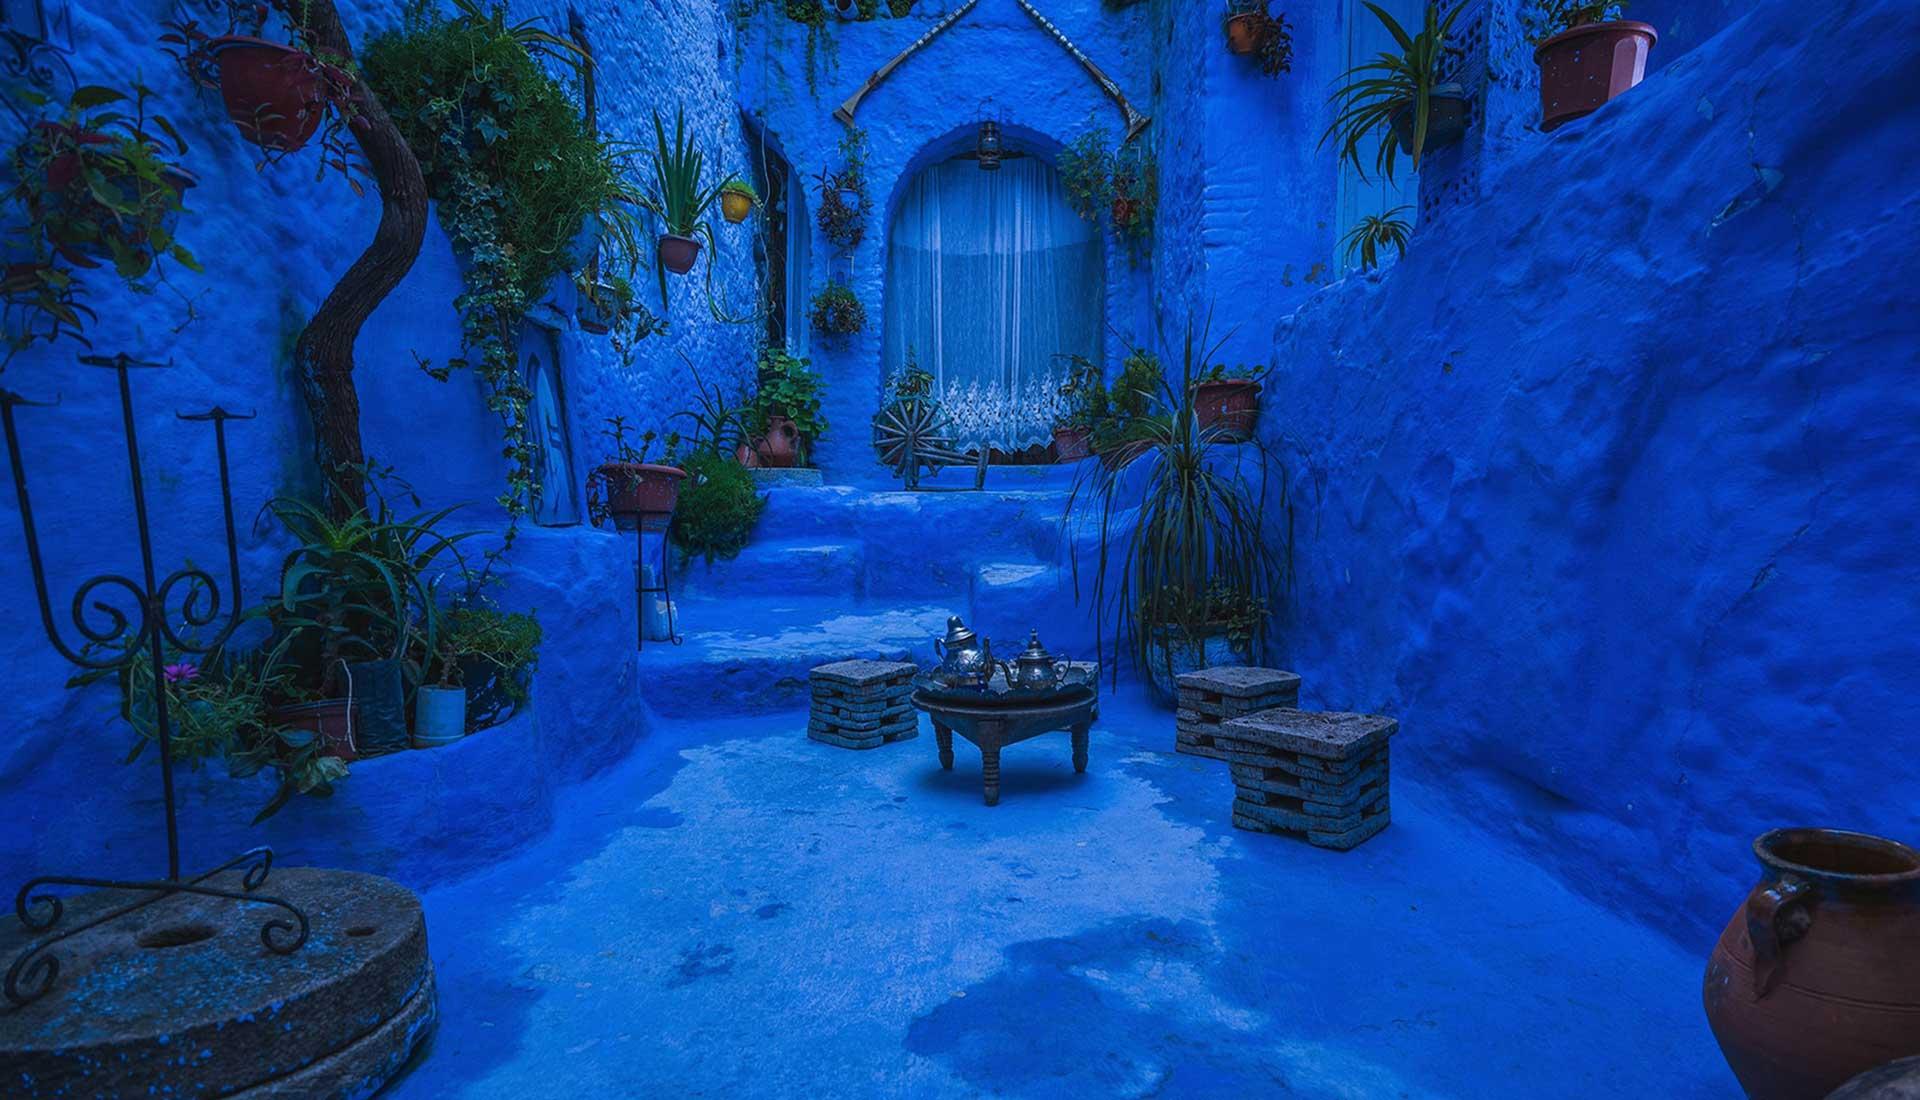 Marruecos2